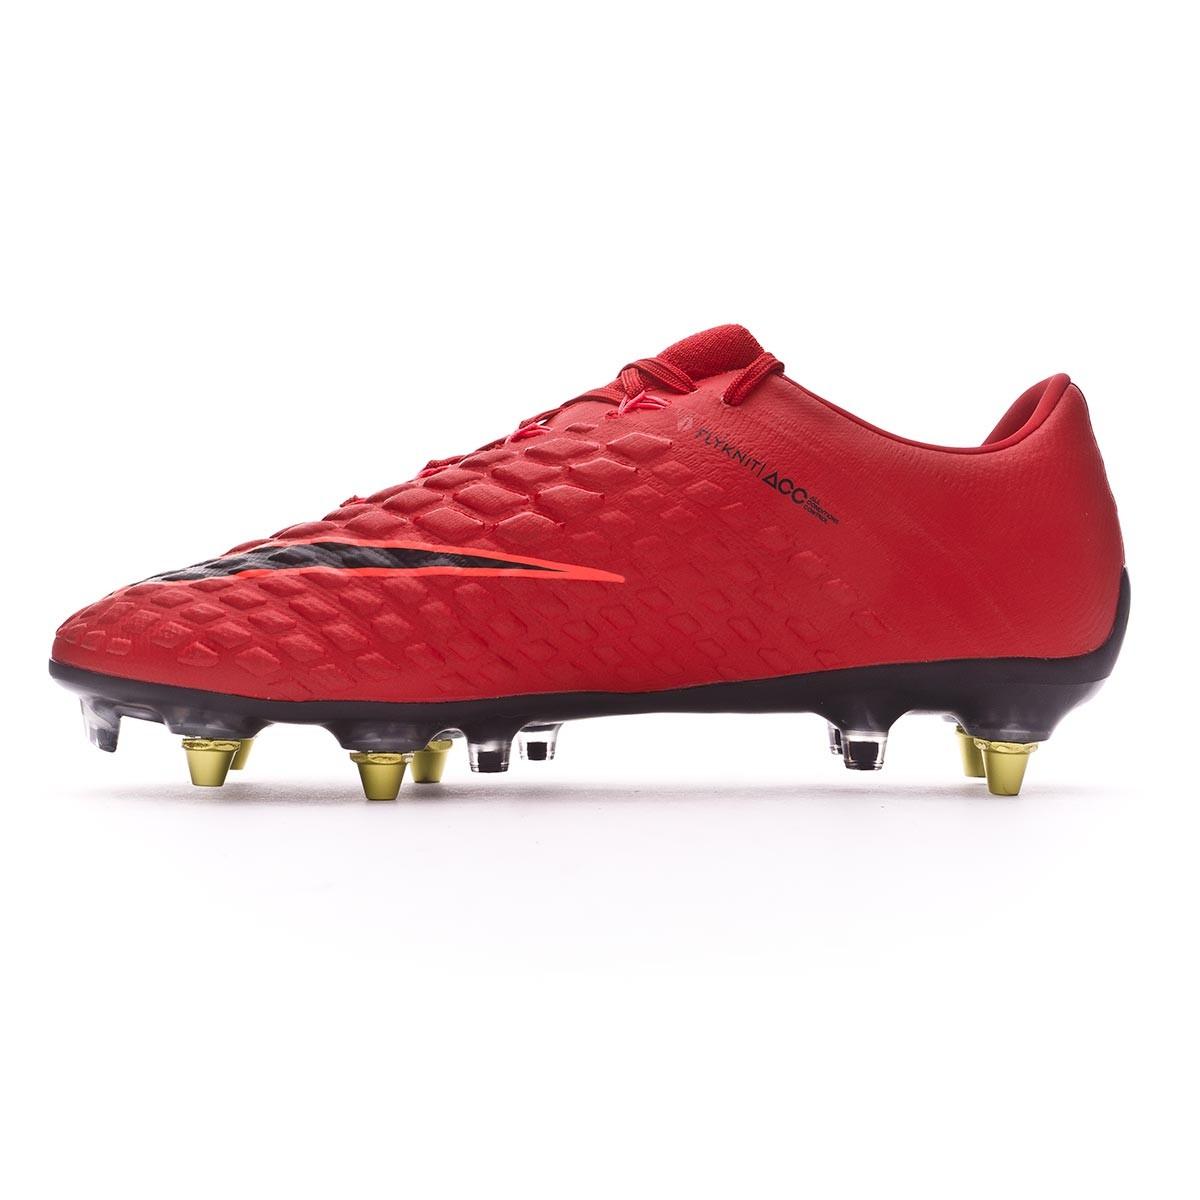 51493fbf509 Football Boots Nike Hypervenom Phantom III Anti-Clog ACC SG-Pro University  red-Black-Bright crimson - Tienda de fútbol Fútbol Emotion